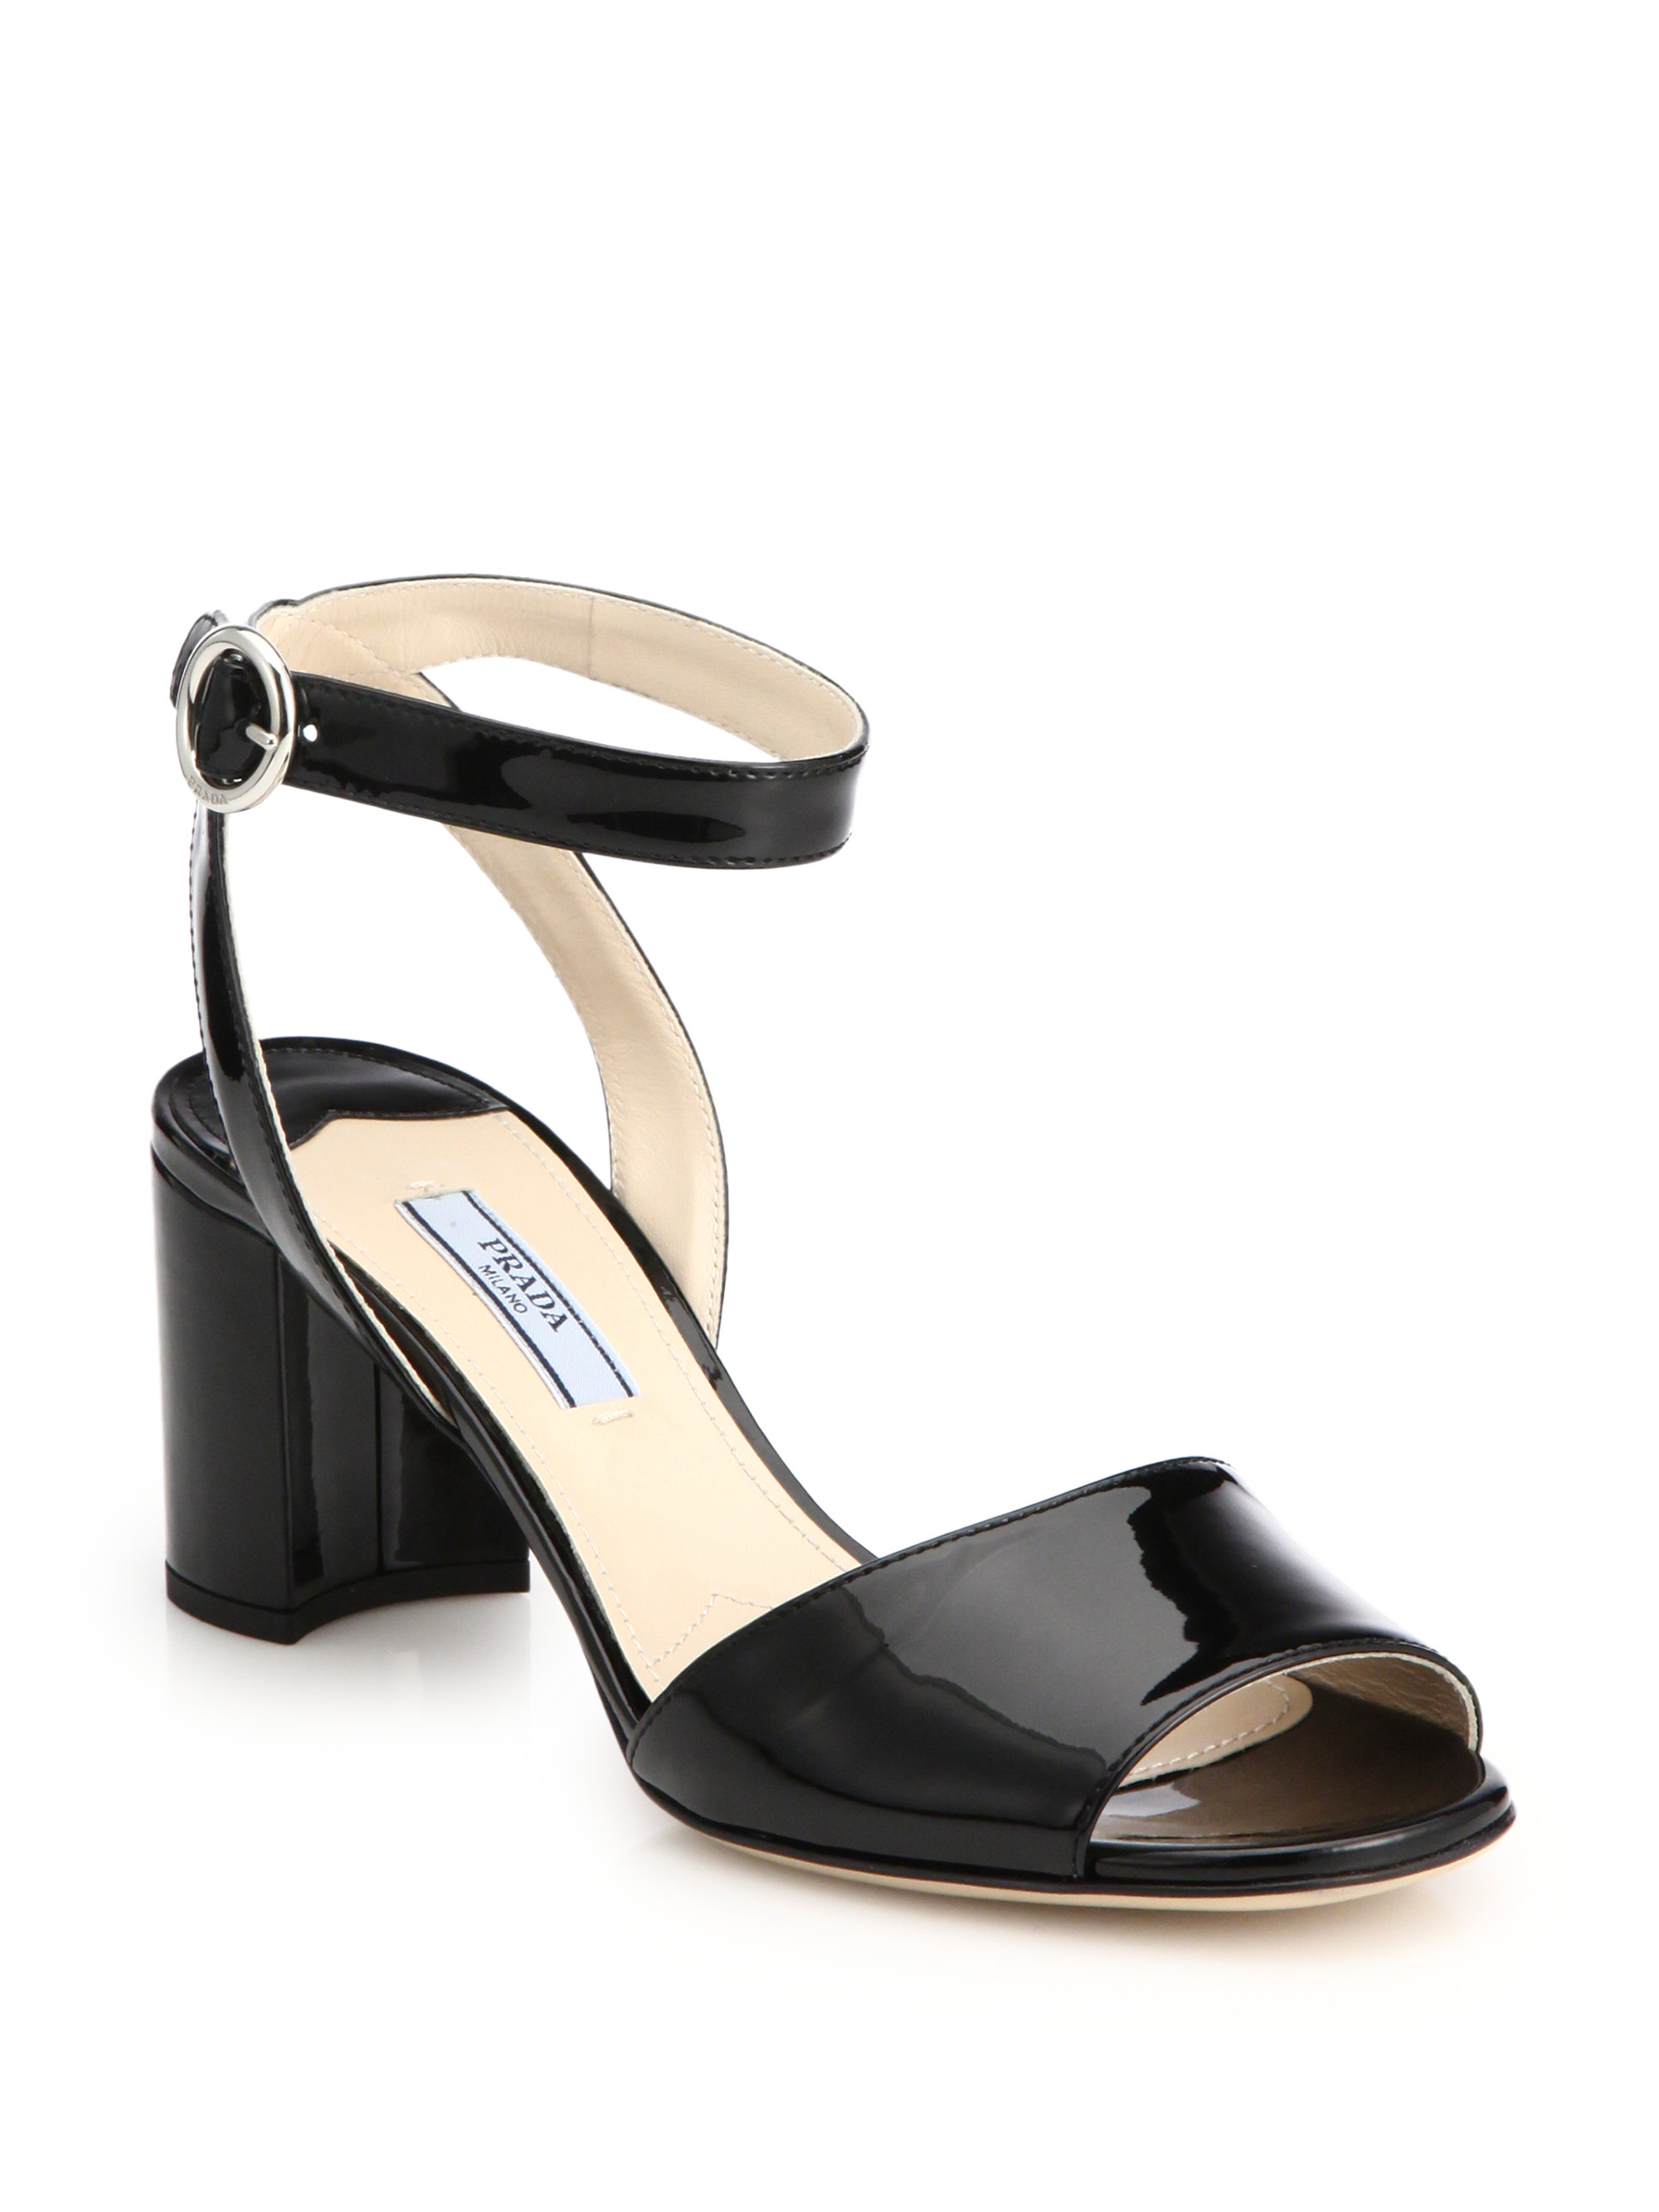 50b754d2ba0 Lyst - Prada Patent Leather Block-Heel Sandals in Black